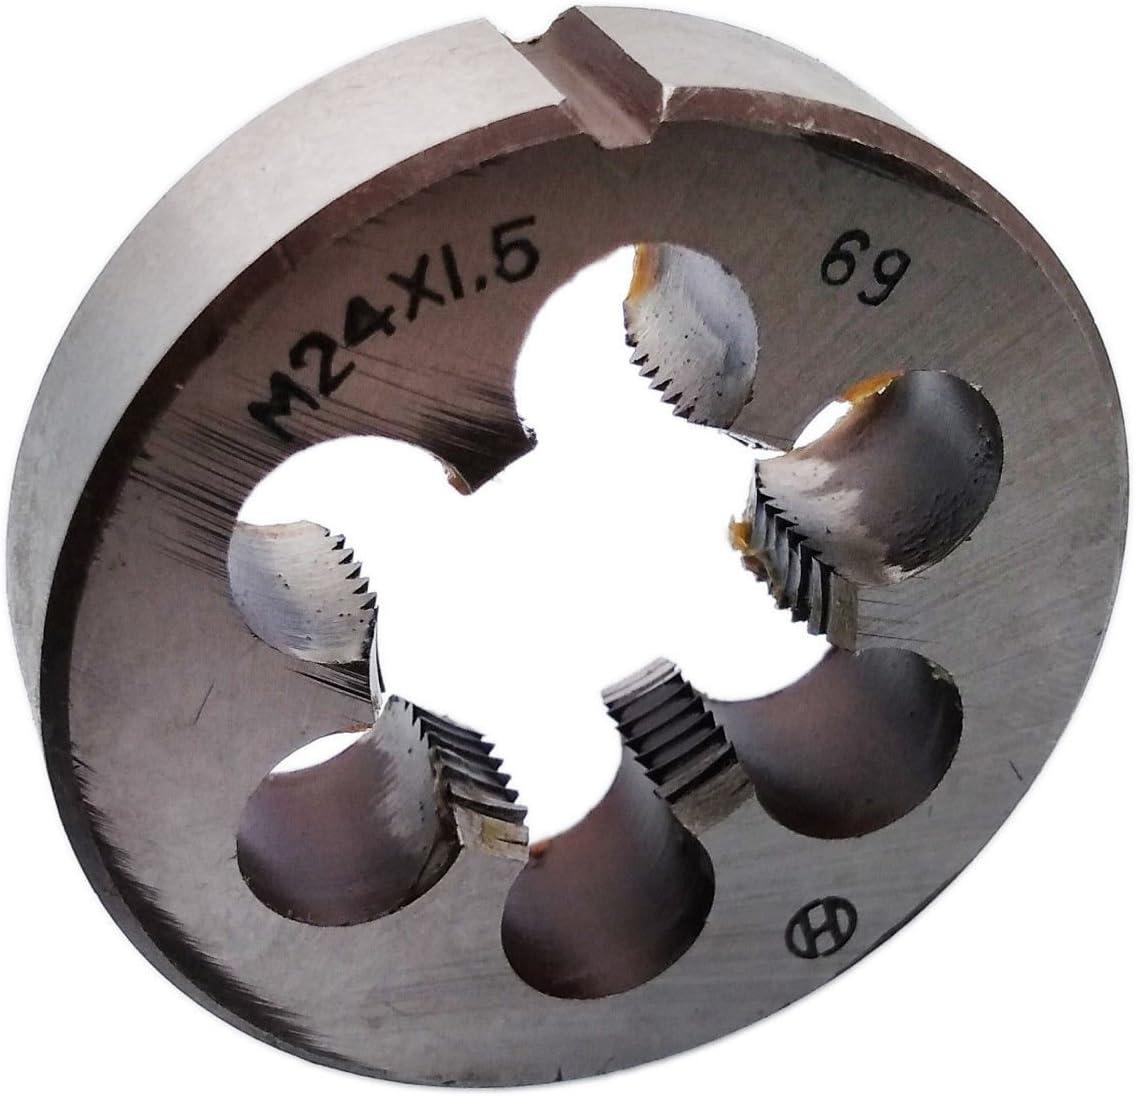 HSS 24mm x 1.5 Metric Die Right Hand Thread M24 x 1.5mm Pitch